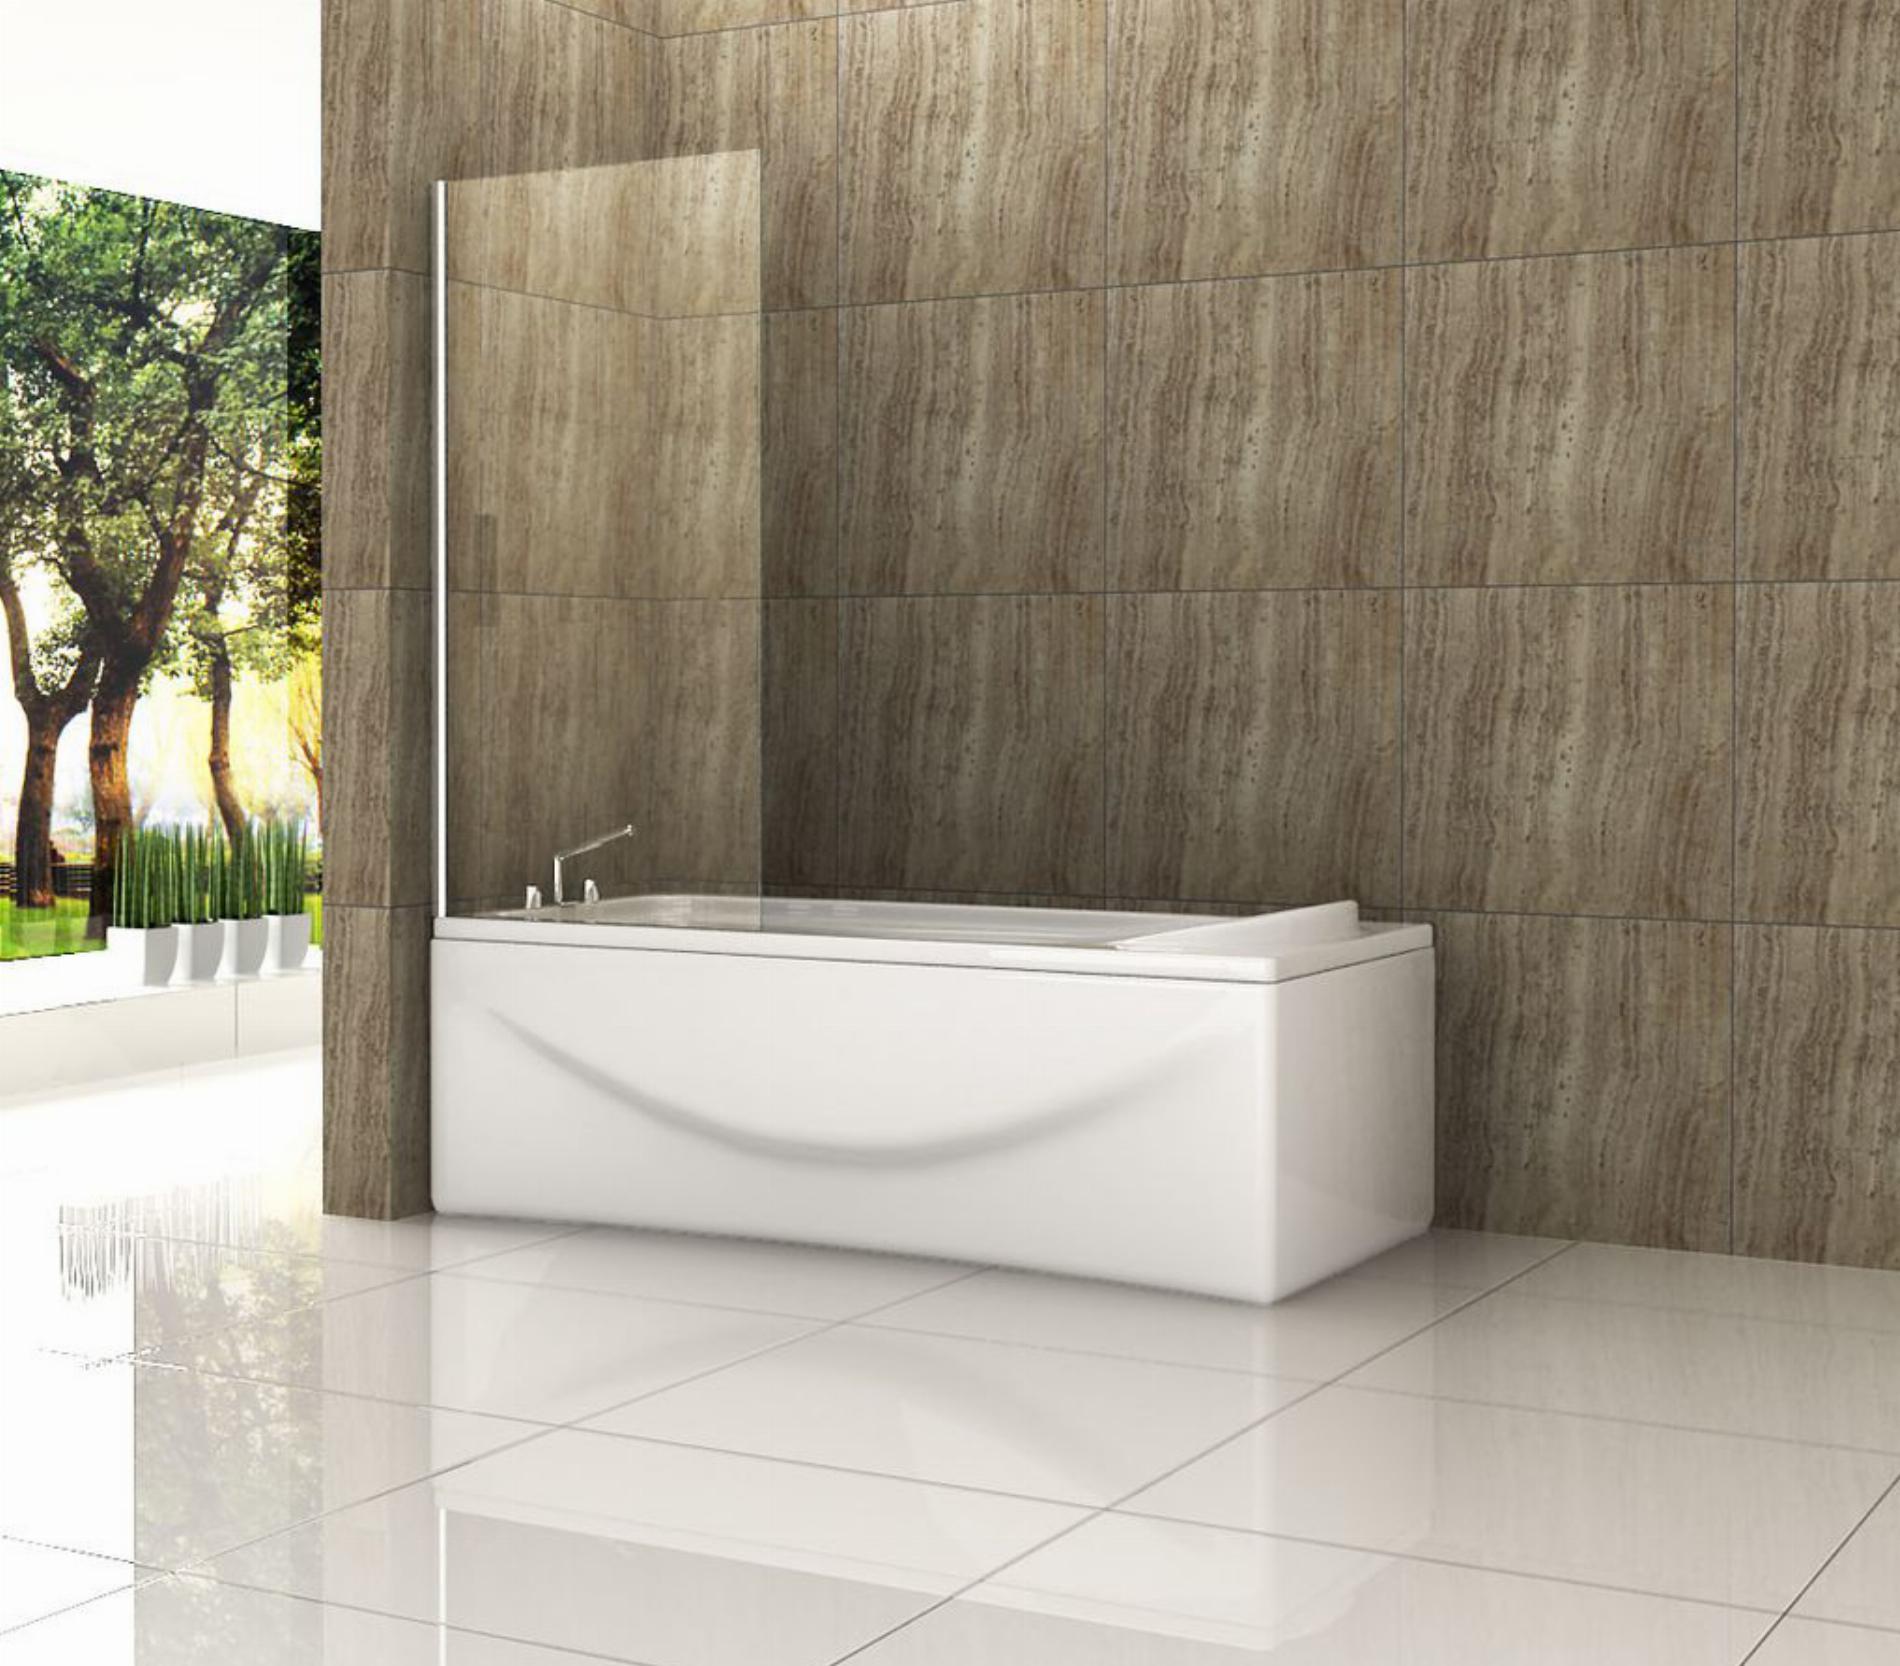 fixe Duschtrennwand STEADY (Badewanne)